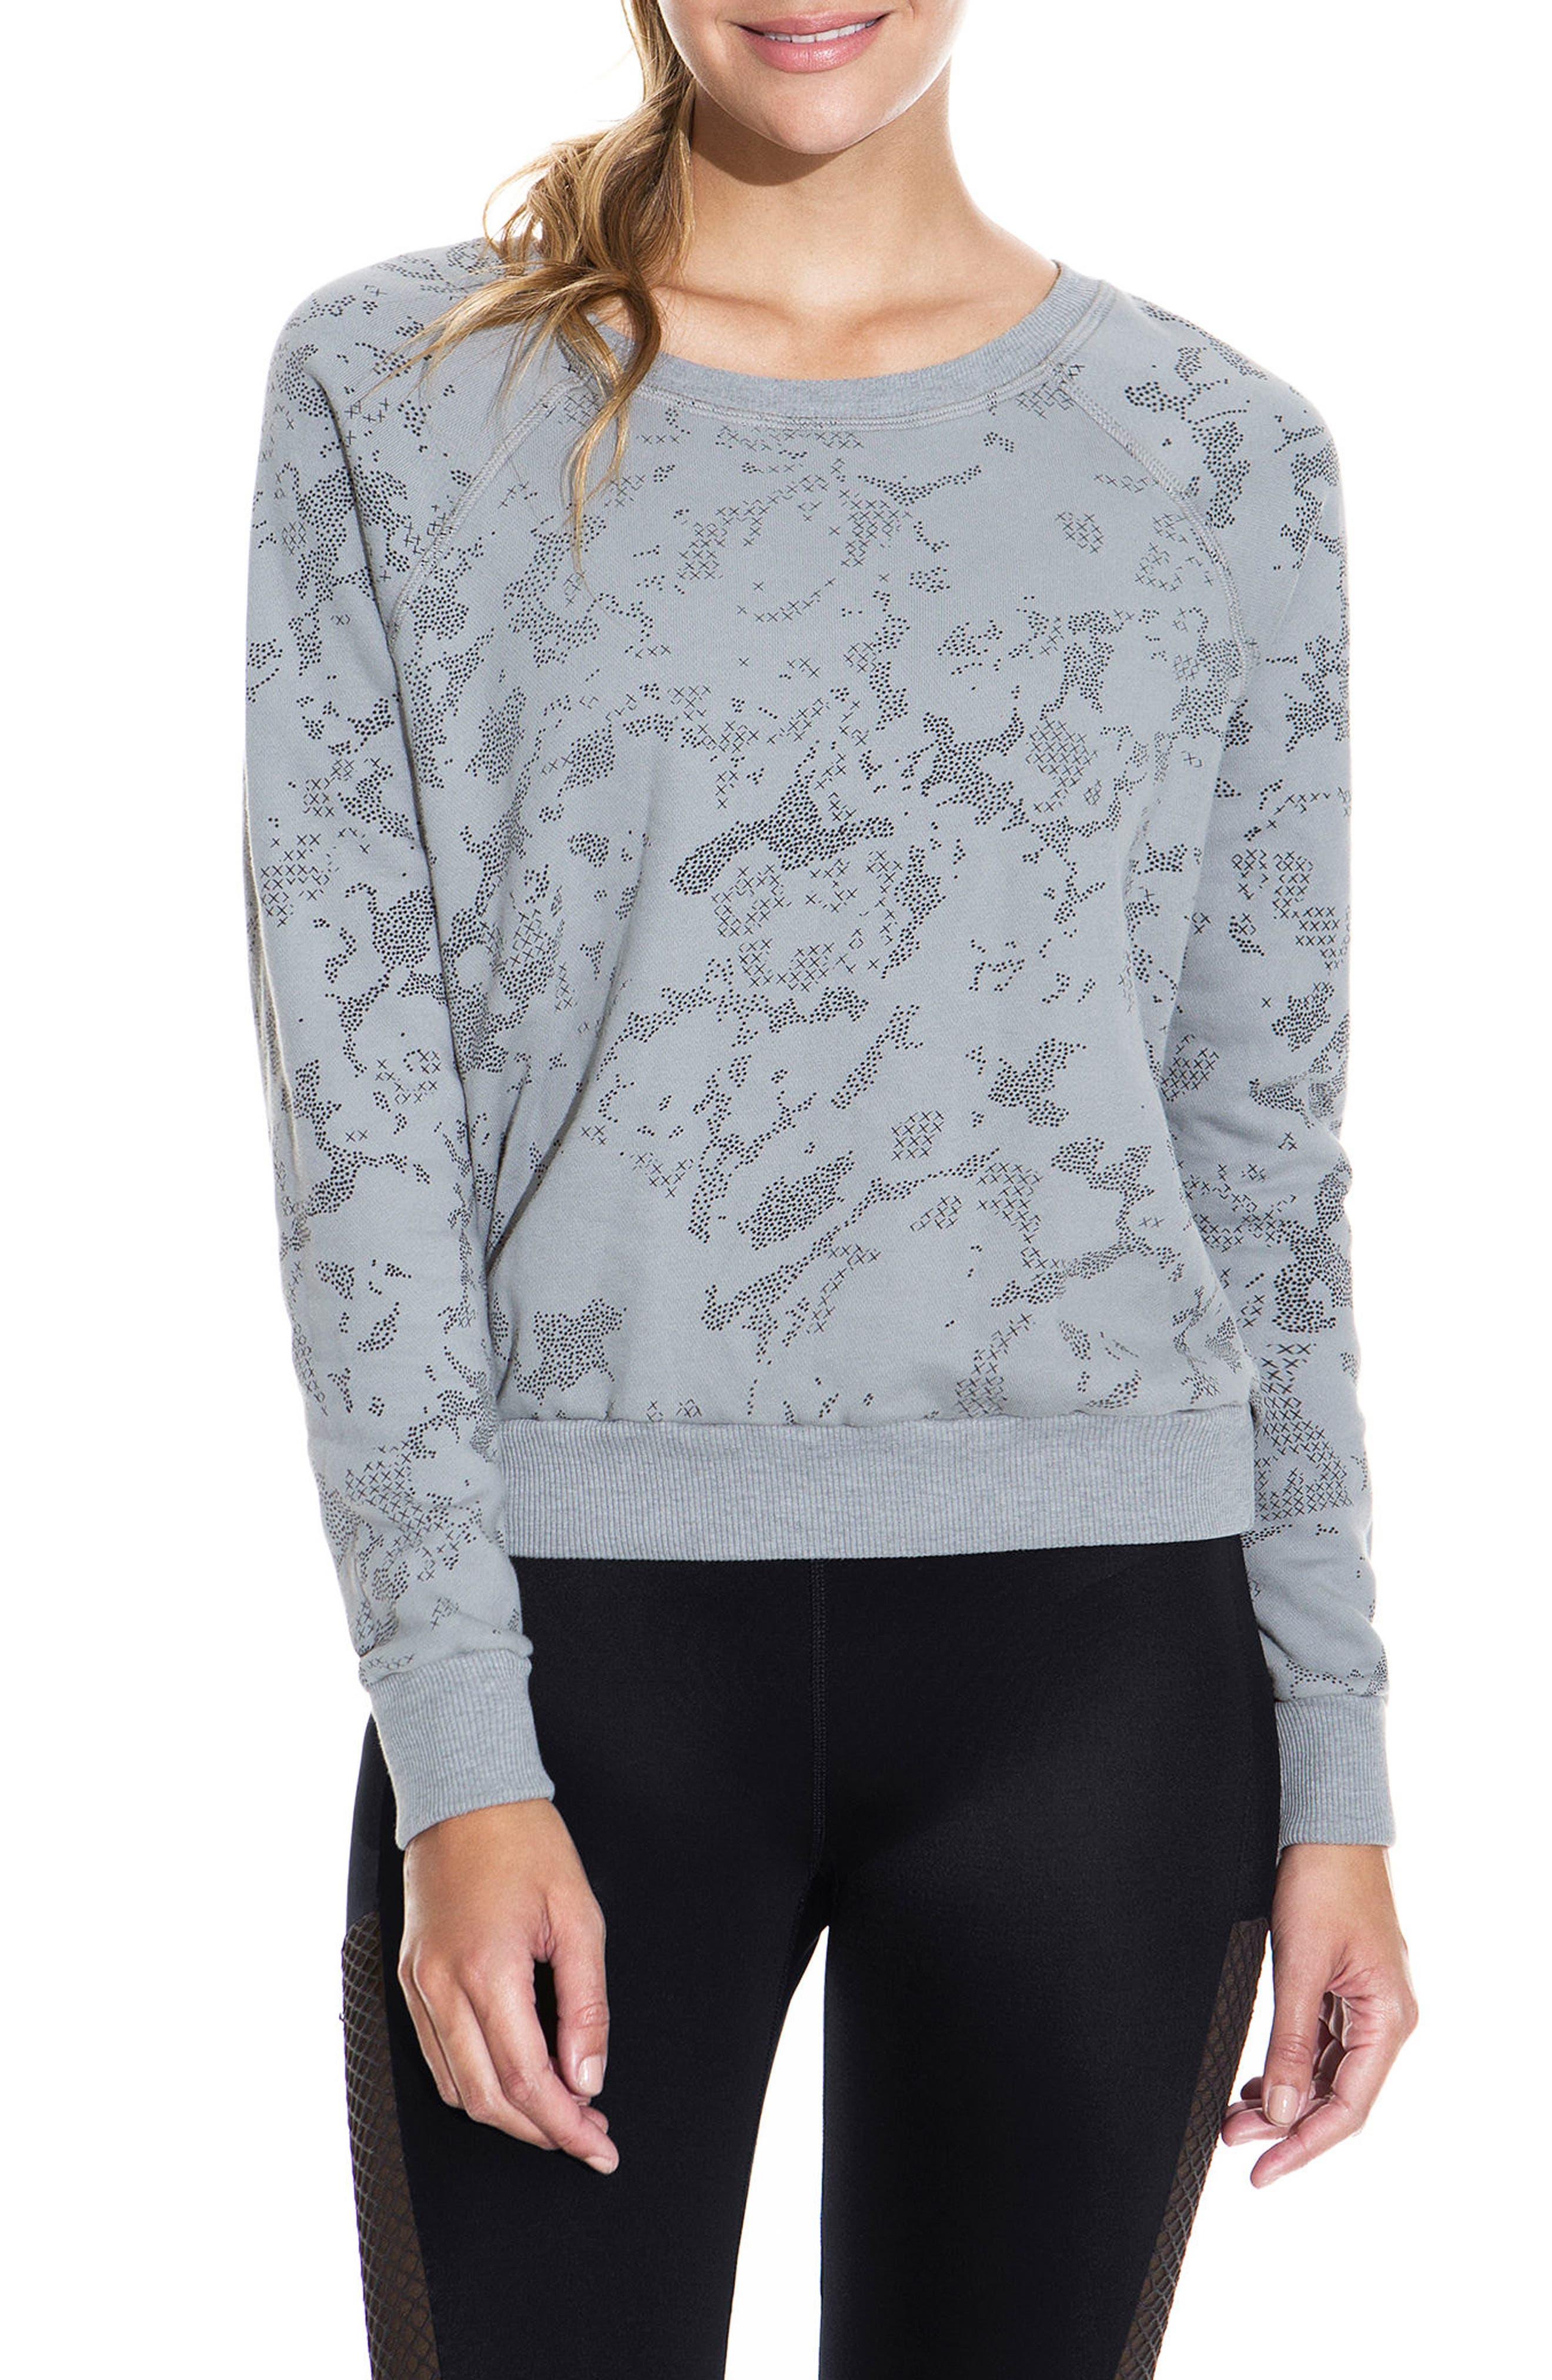 Sleek Camo Granite Sweatshirt,                         Main,                         color, MED GRAY